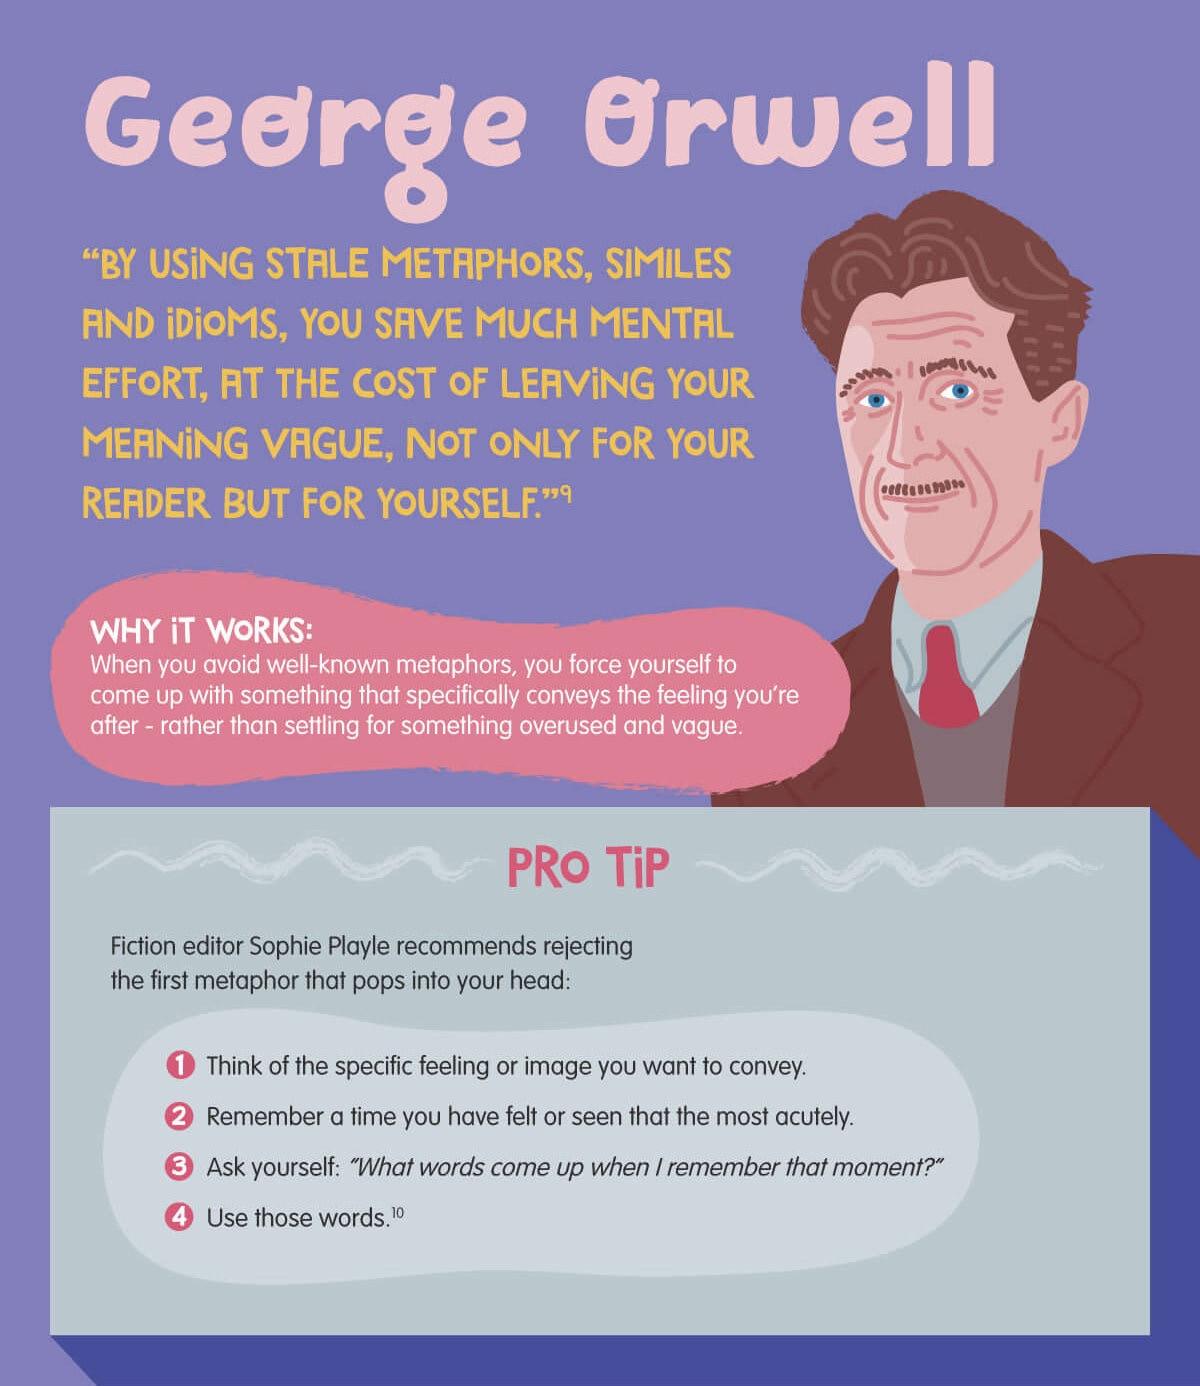 George Orwell on writing